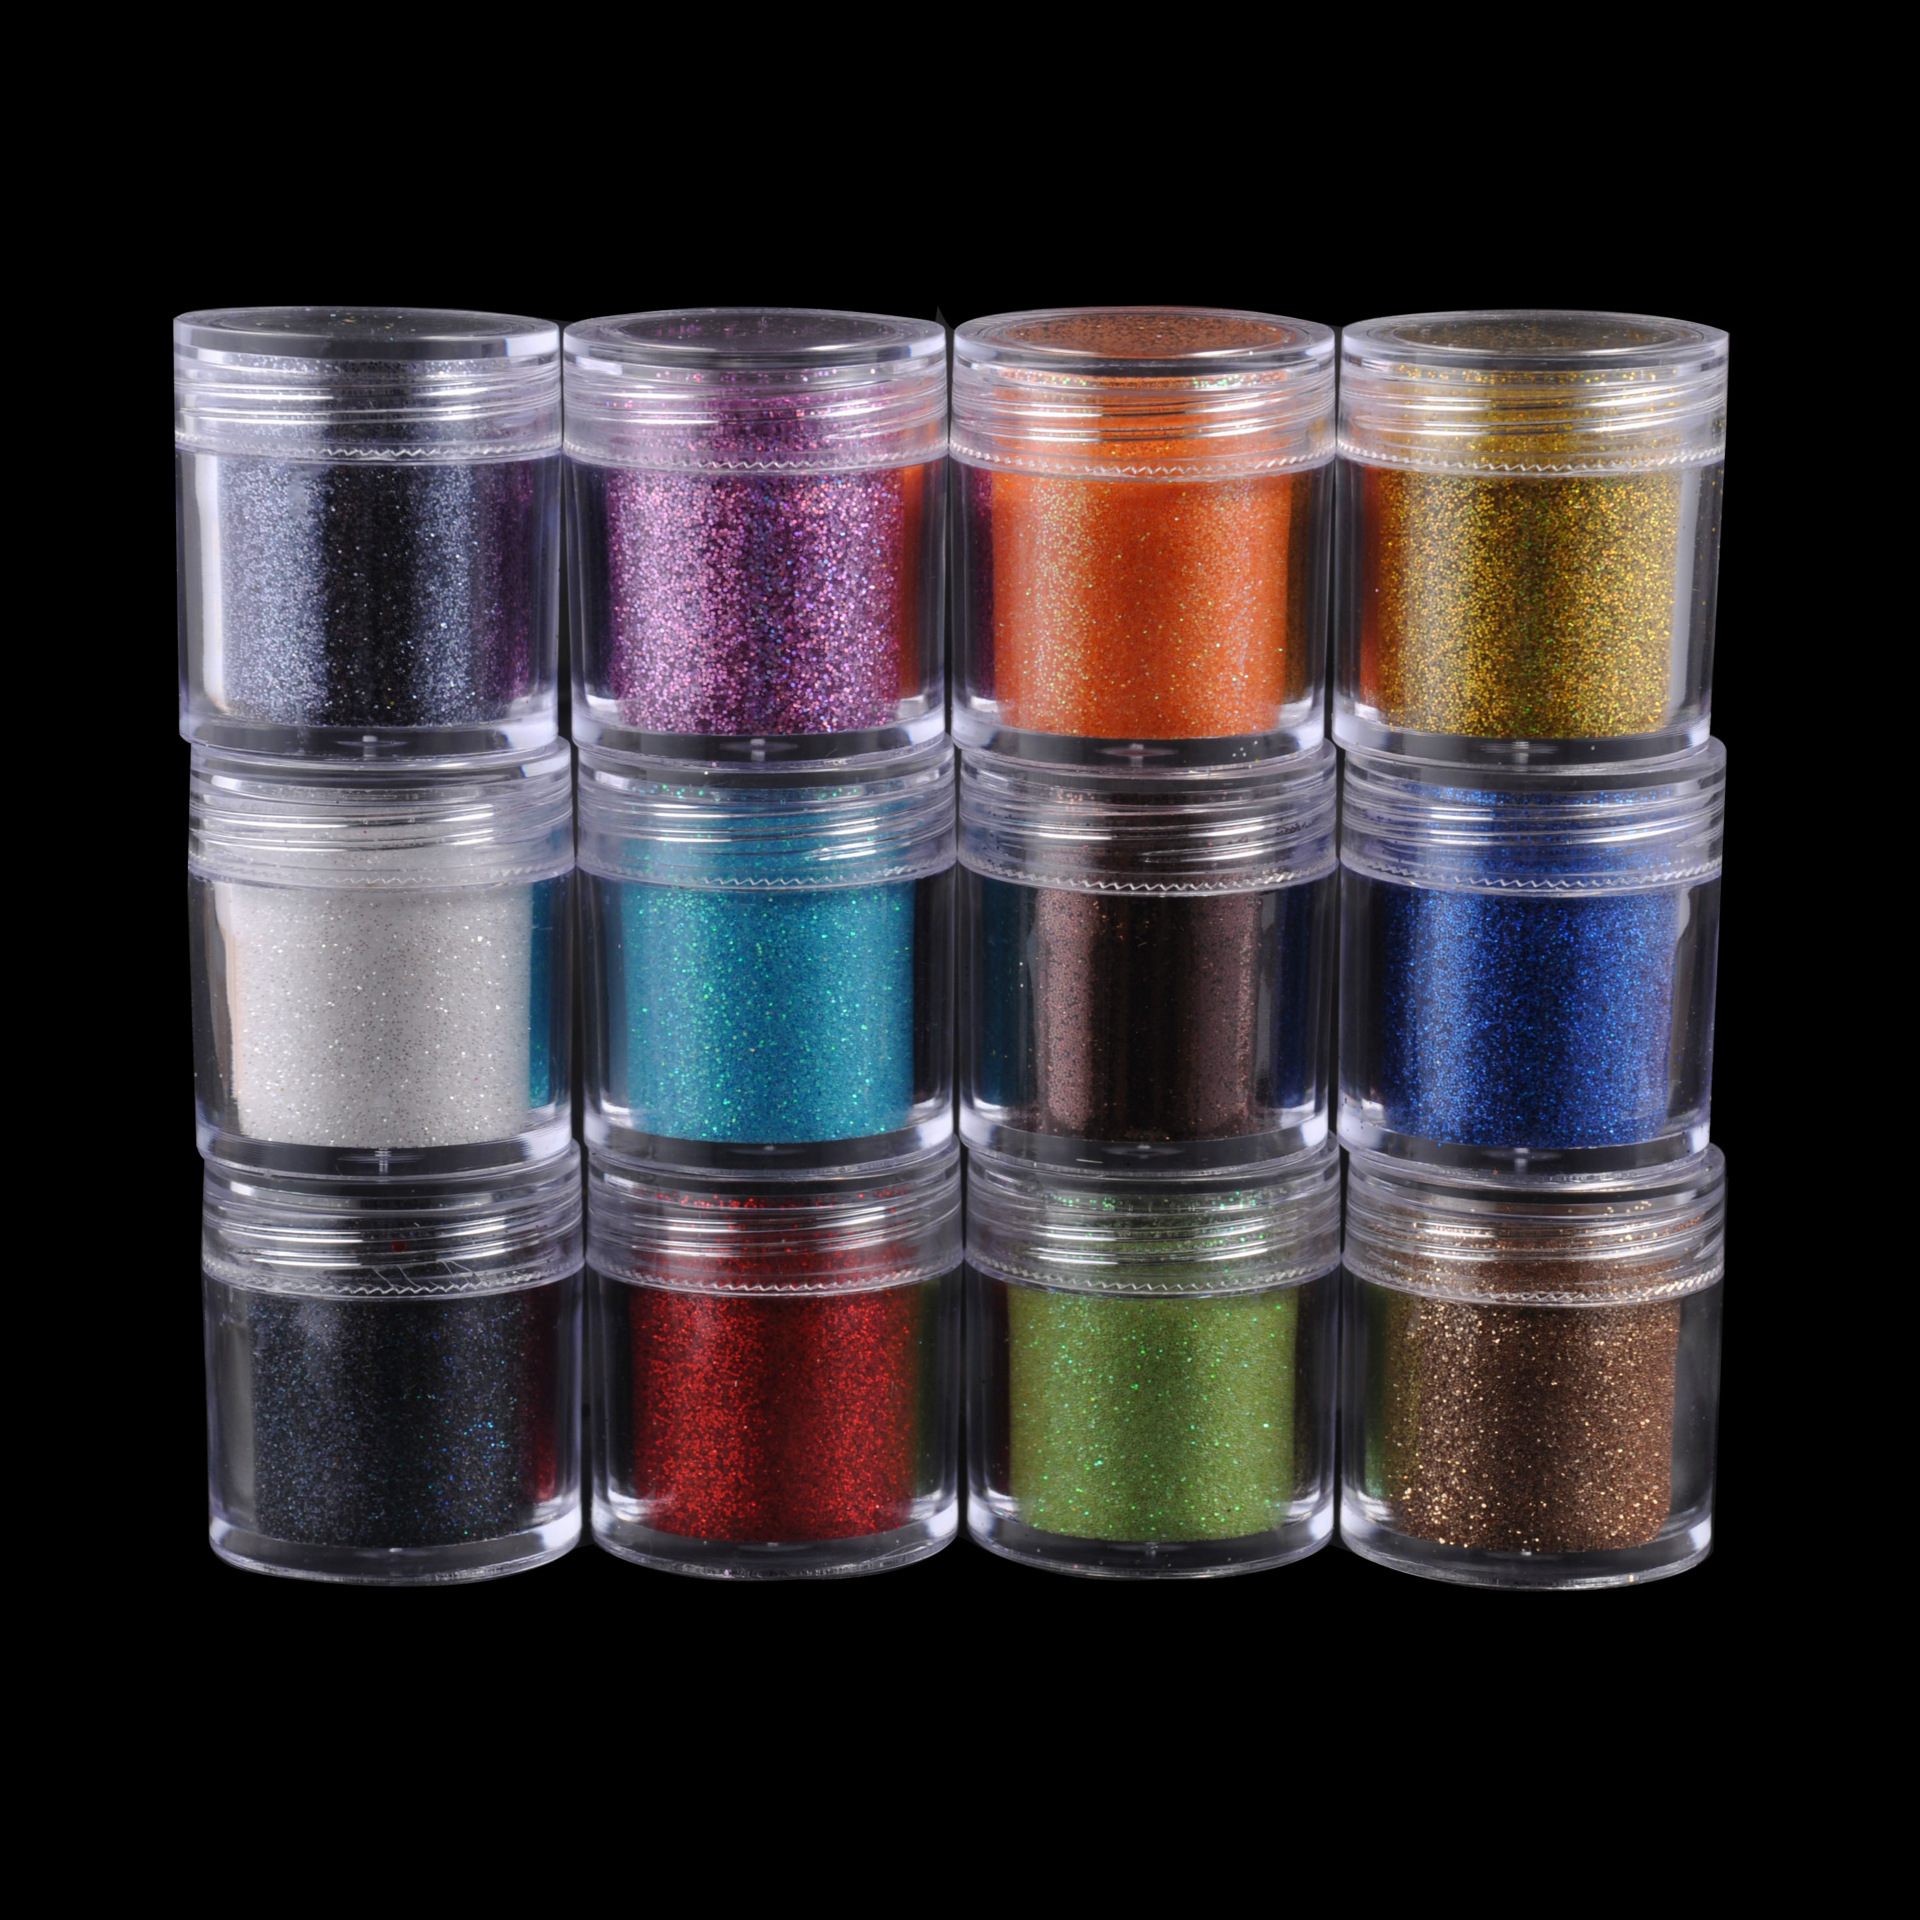 Best Nail Glitter Shiny Matte Shell Colorful Nail Art Pigment Dust Powder Manicure Nail Decorations P036